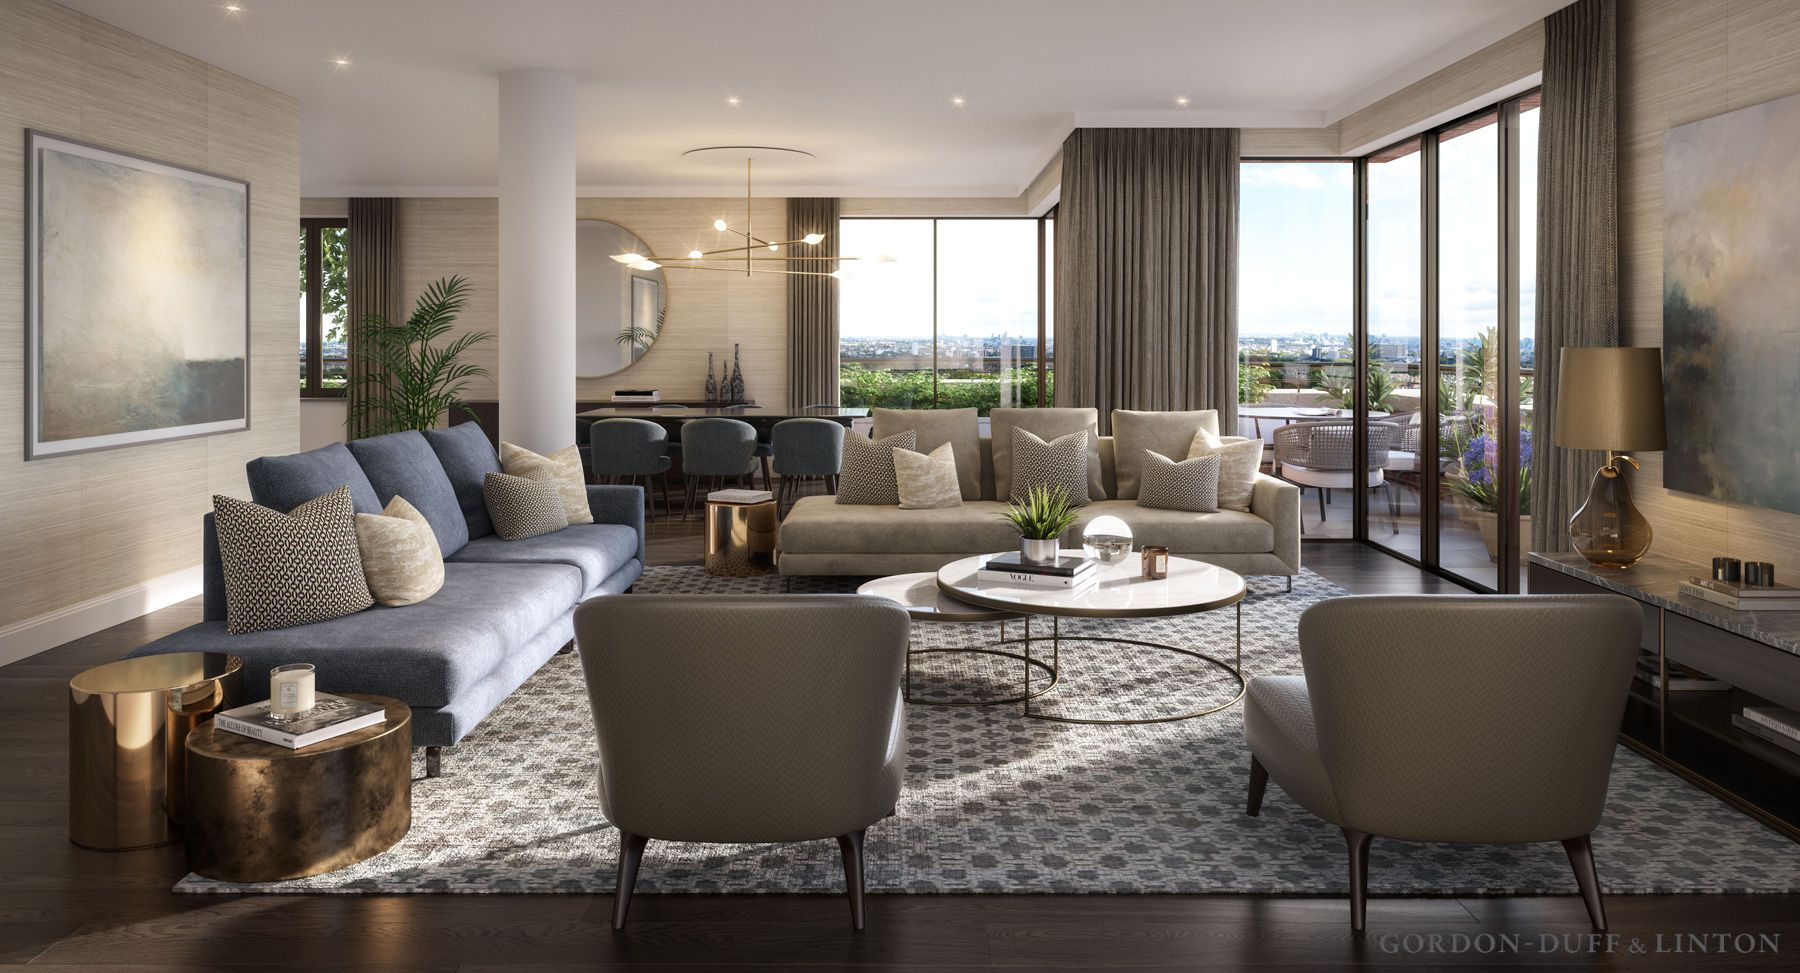 New End Gordon Duff & Linton One bedroom apartment, 1